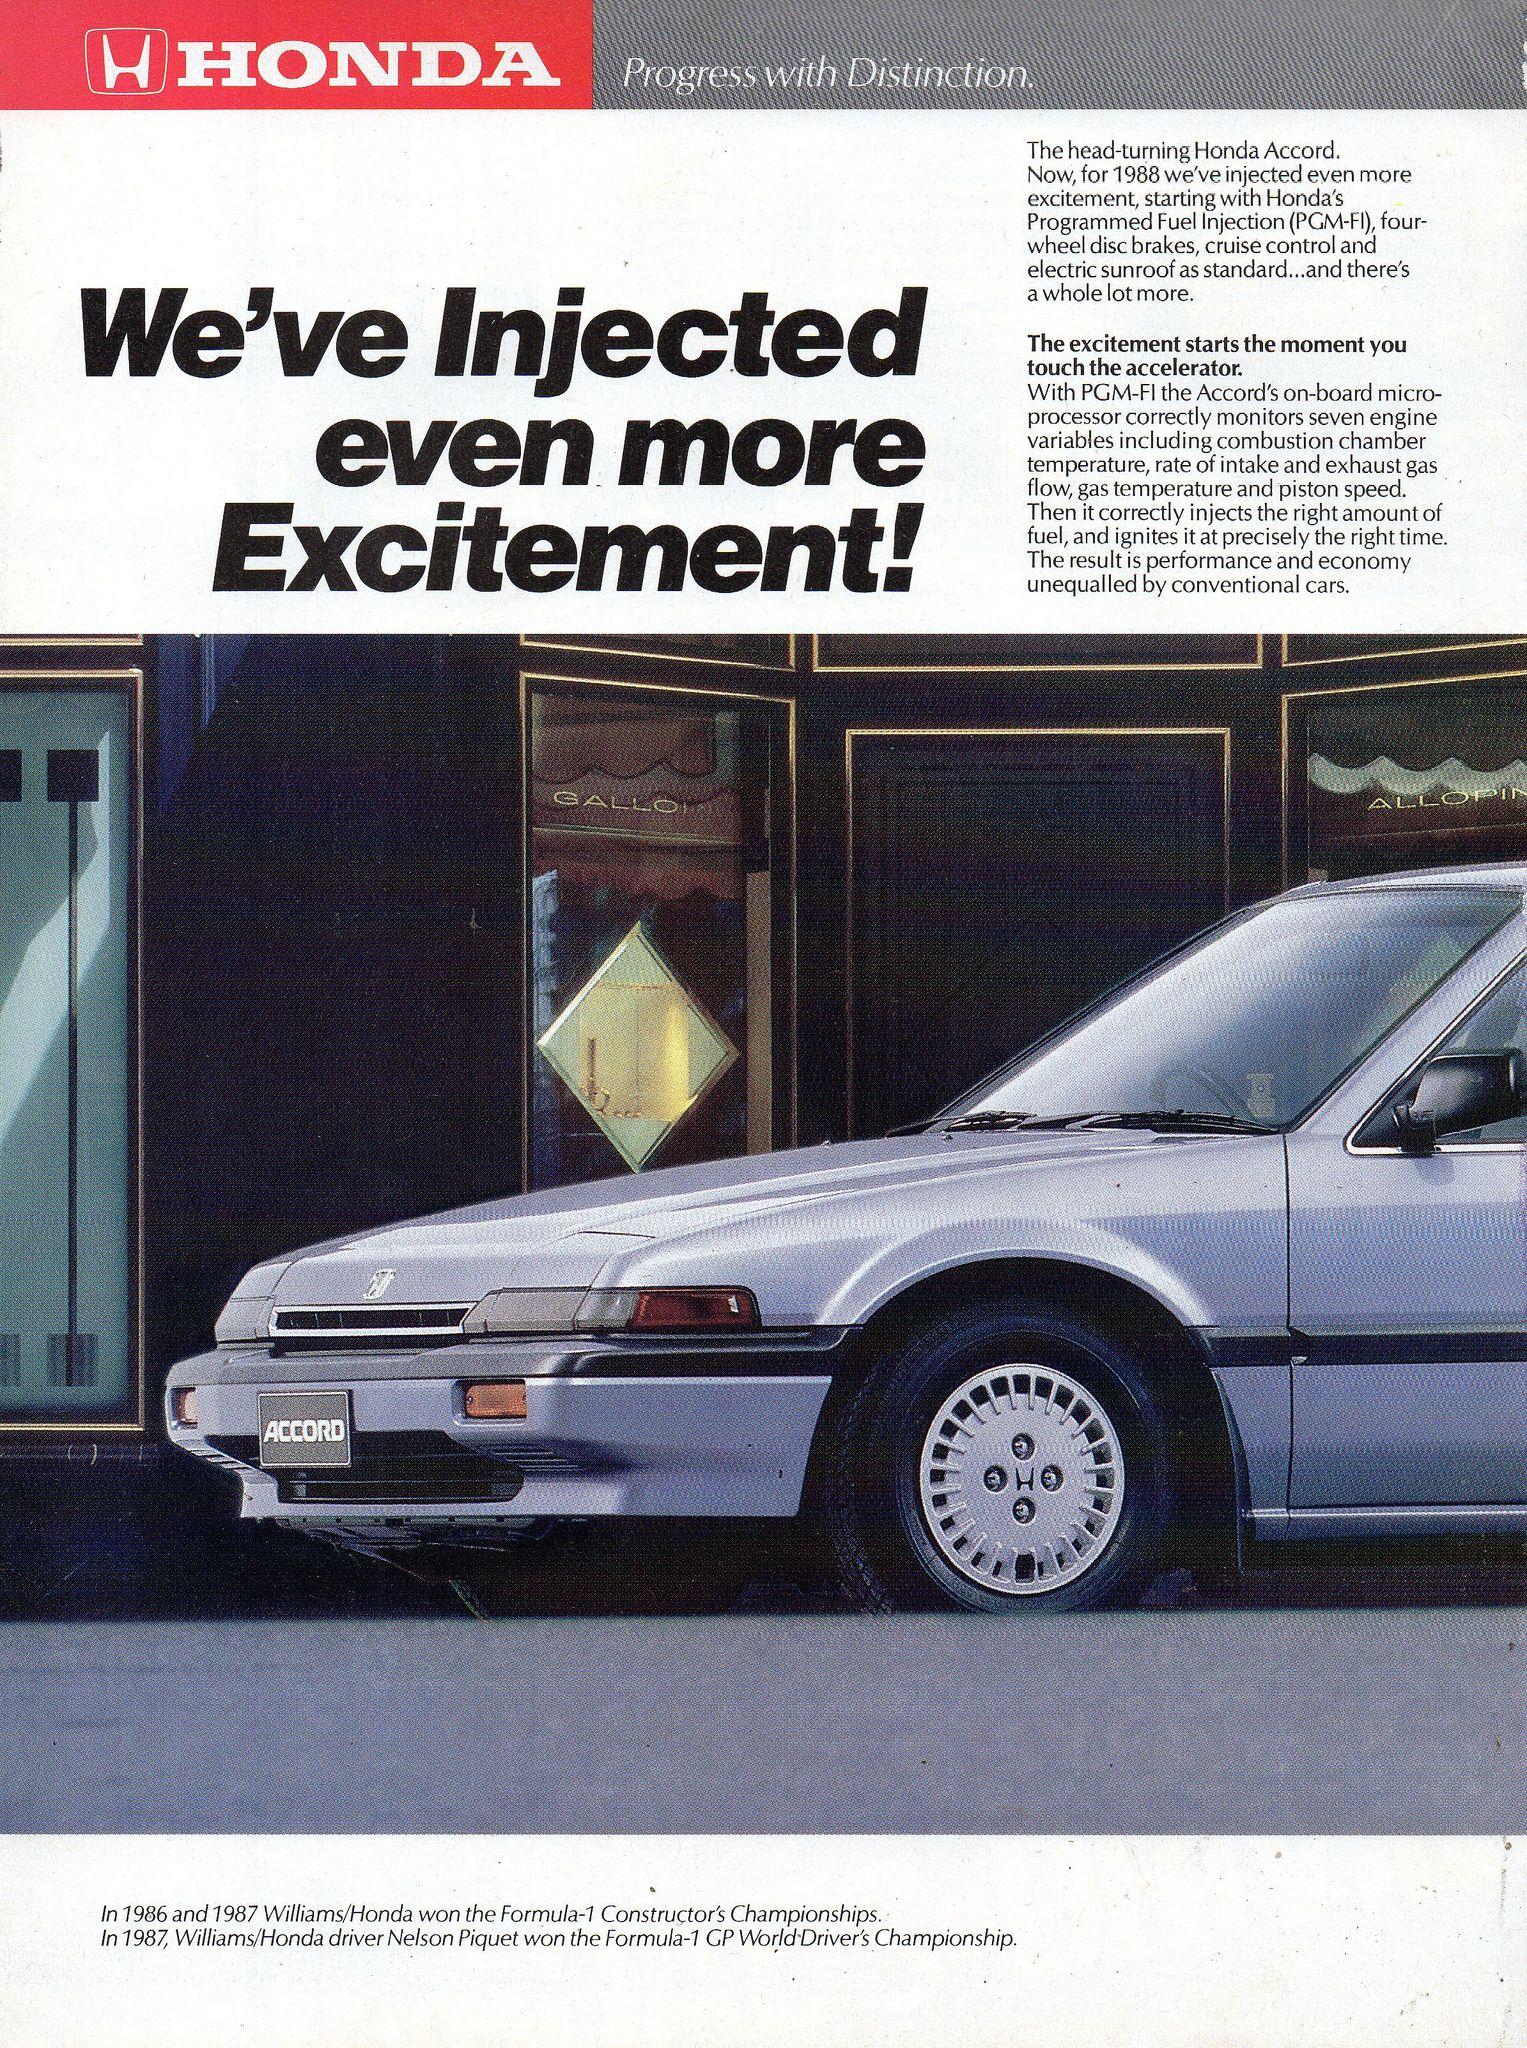 1988 Honda Range Of Prestiage Cars Accord 2 0si Sedan Page 10 Aussie Original Magazine Advertisement Honda Sedan Car Advertising